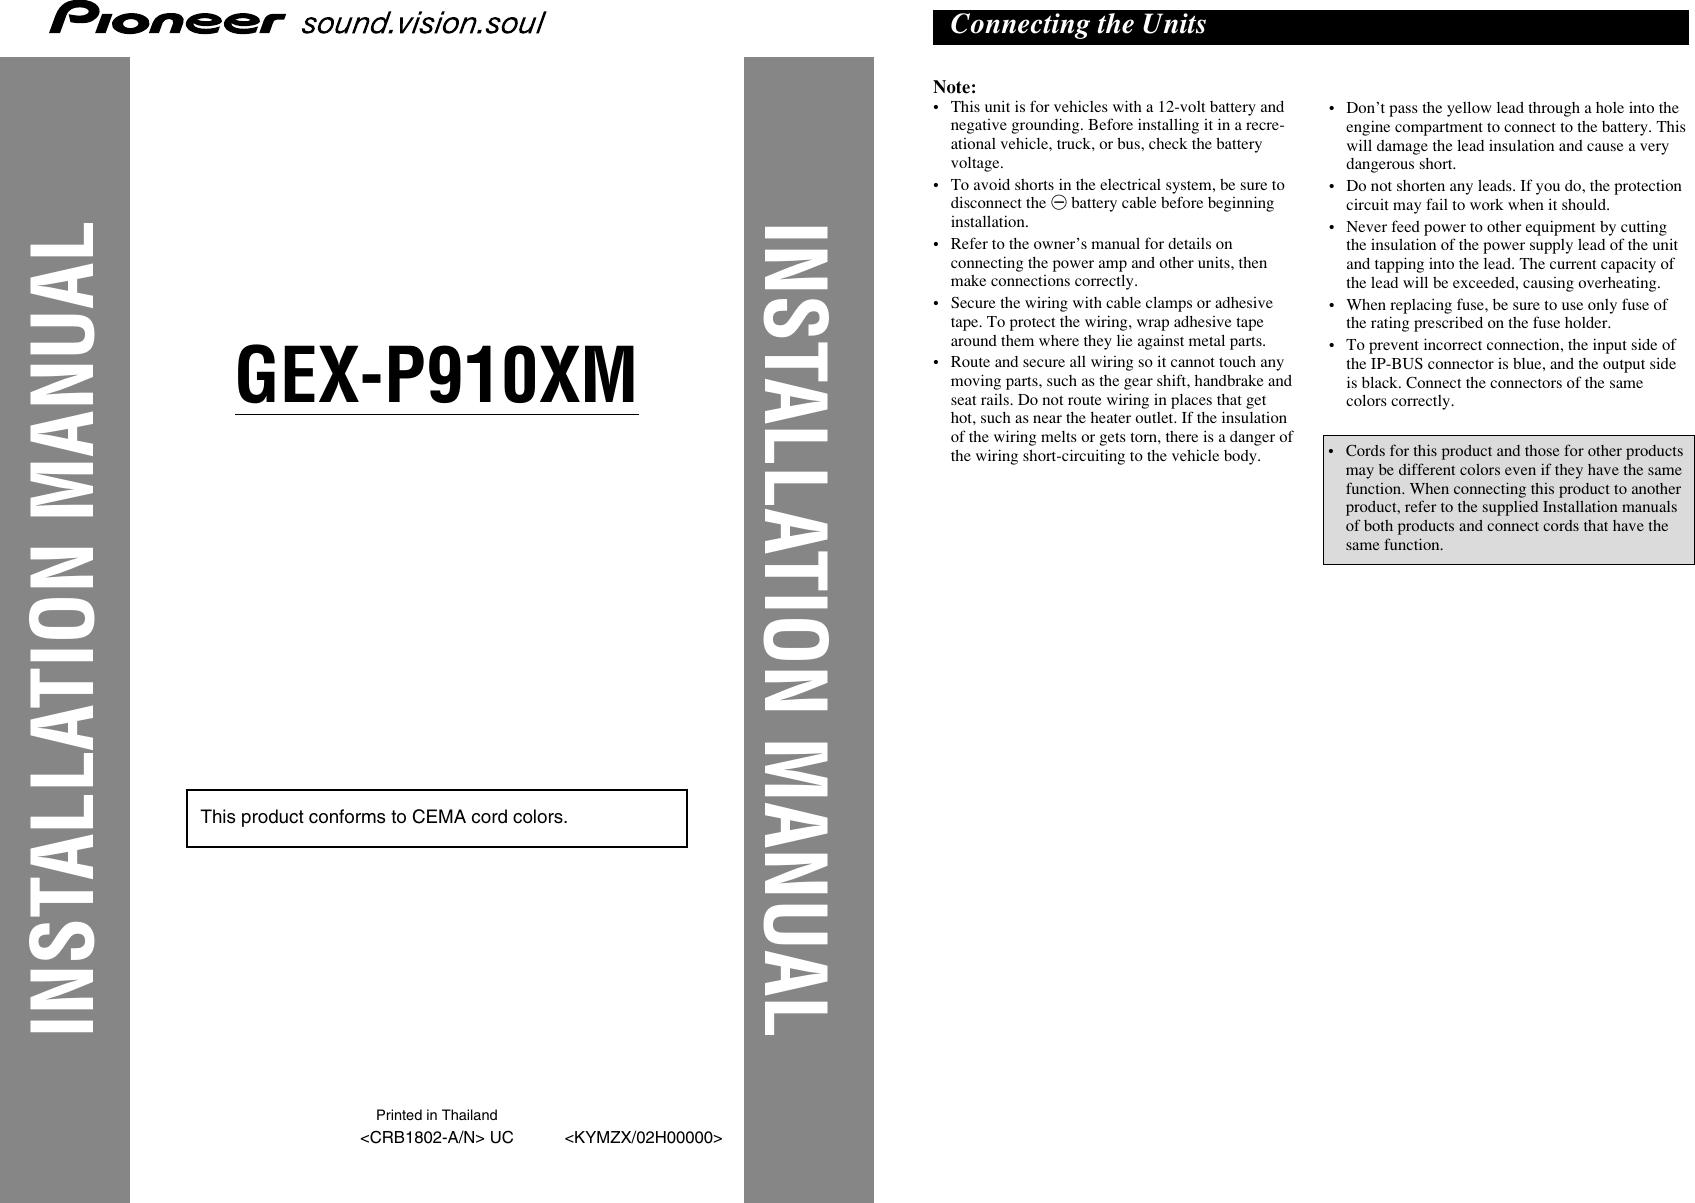 pioneer gex p910xm users manual crb1802 a rh usermanual wiki